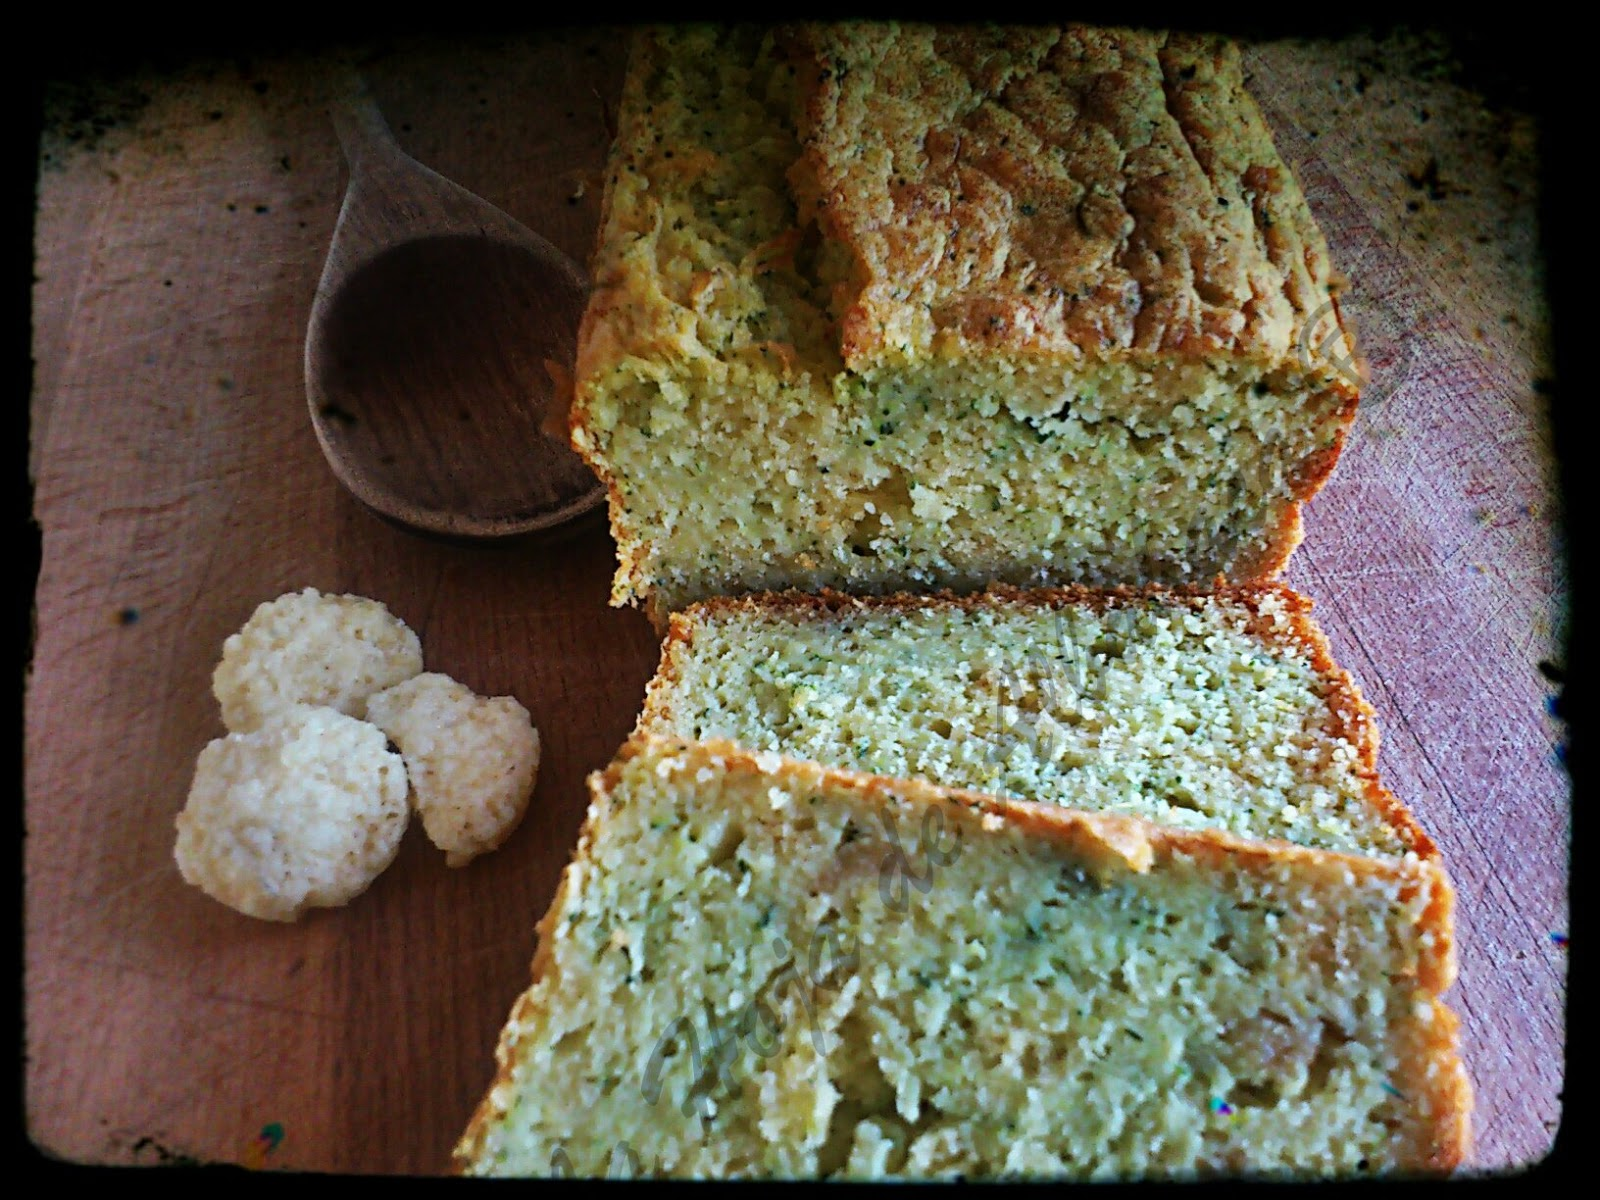 cake de calabacín, calabacín, grok, parmesano, pastel